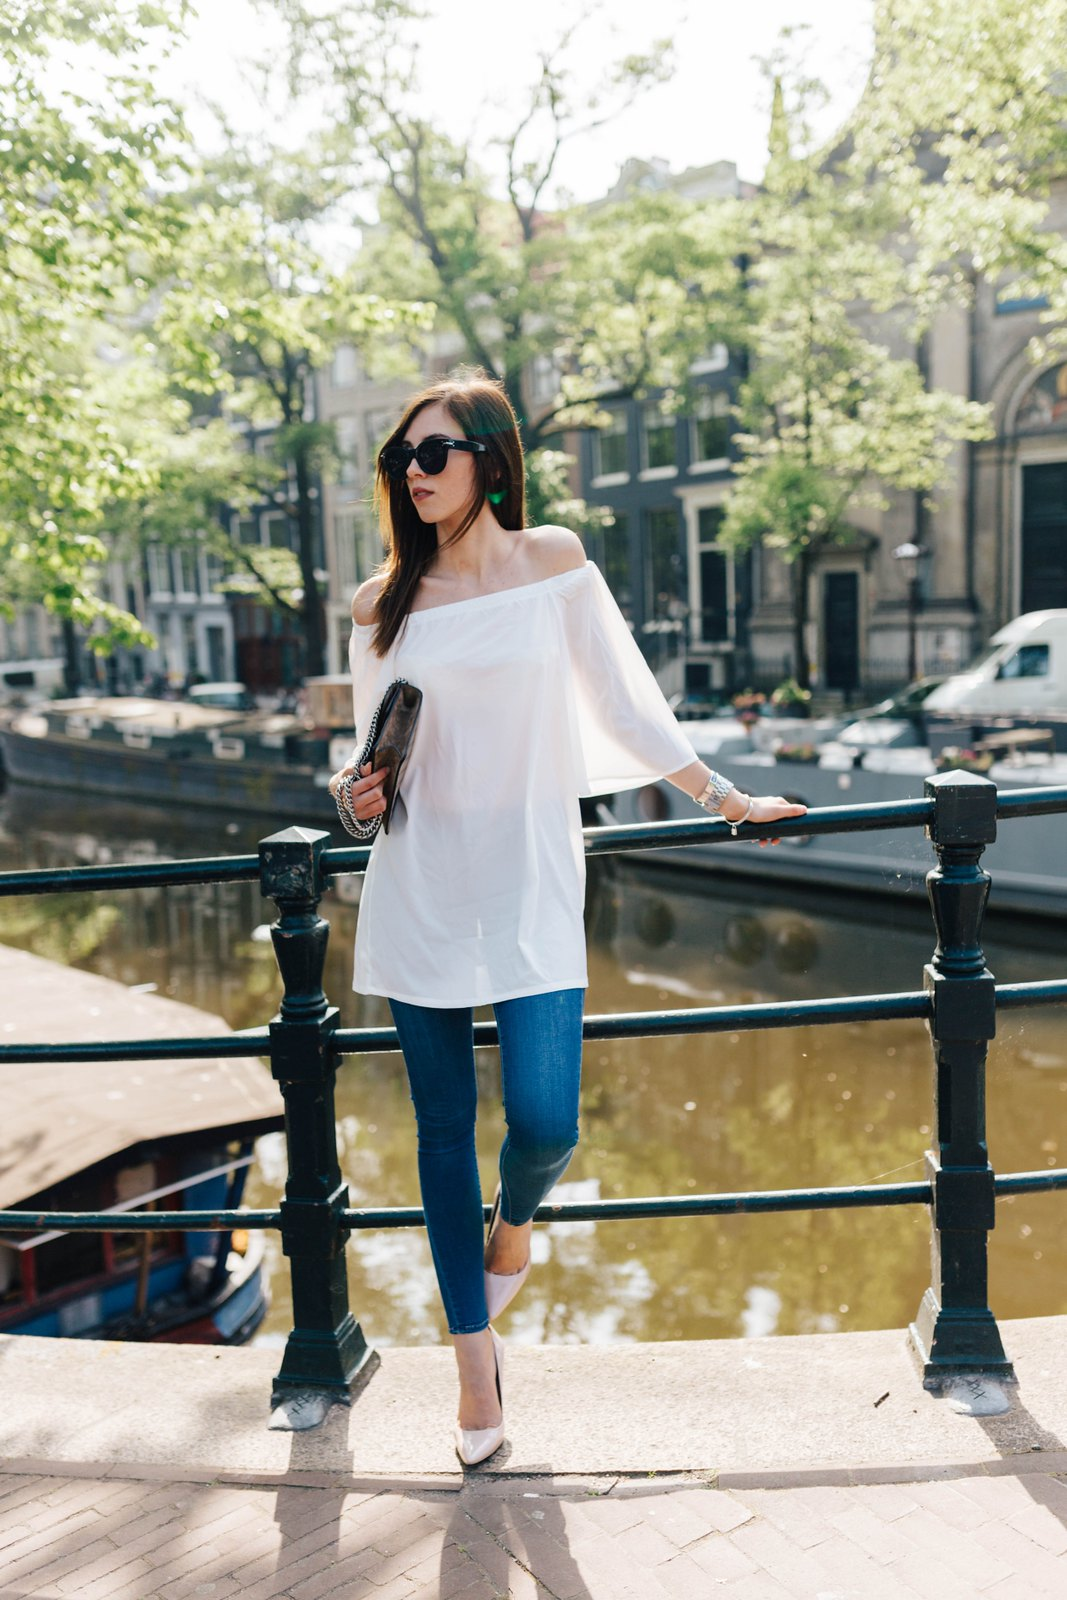 amsterdamphotowalk-112